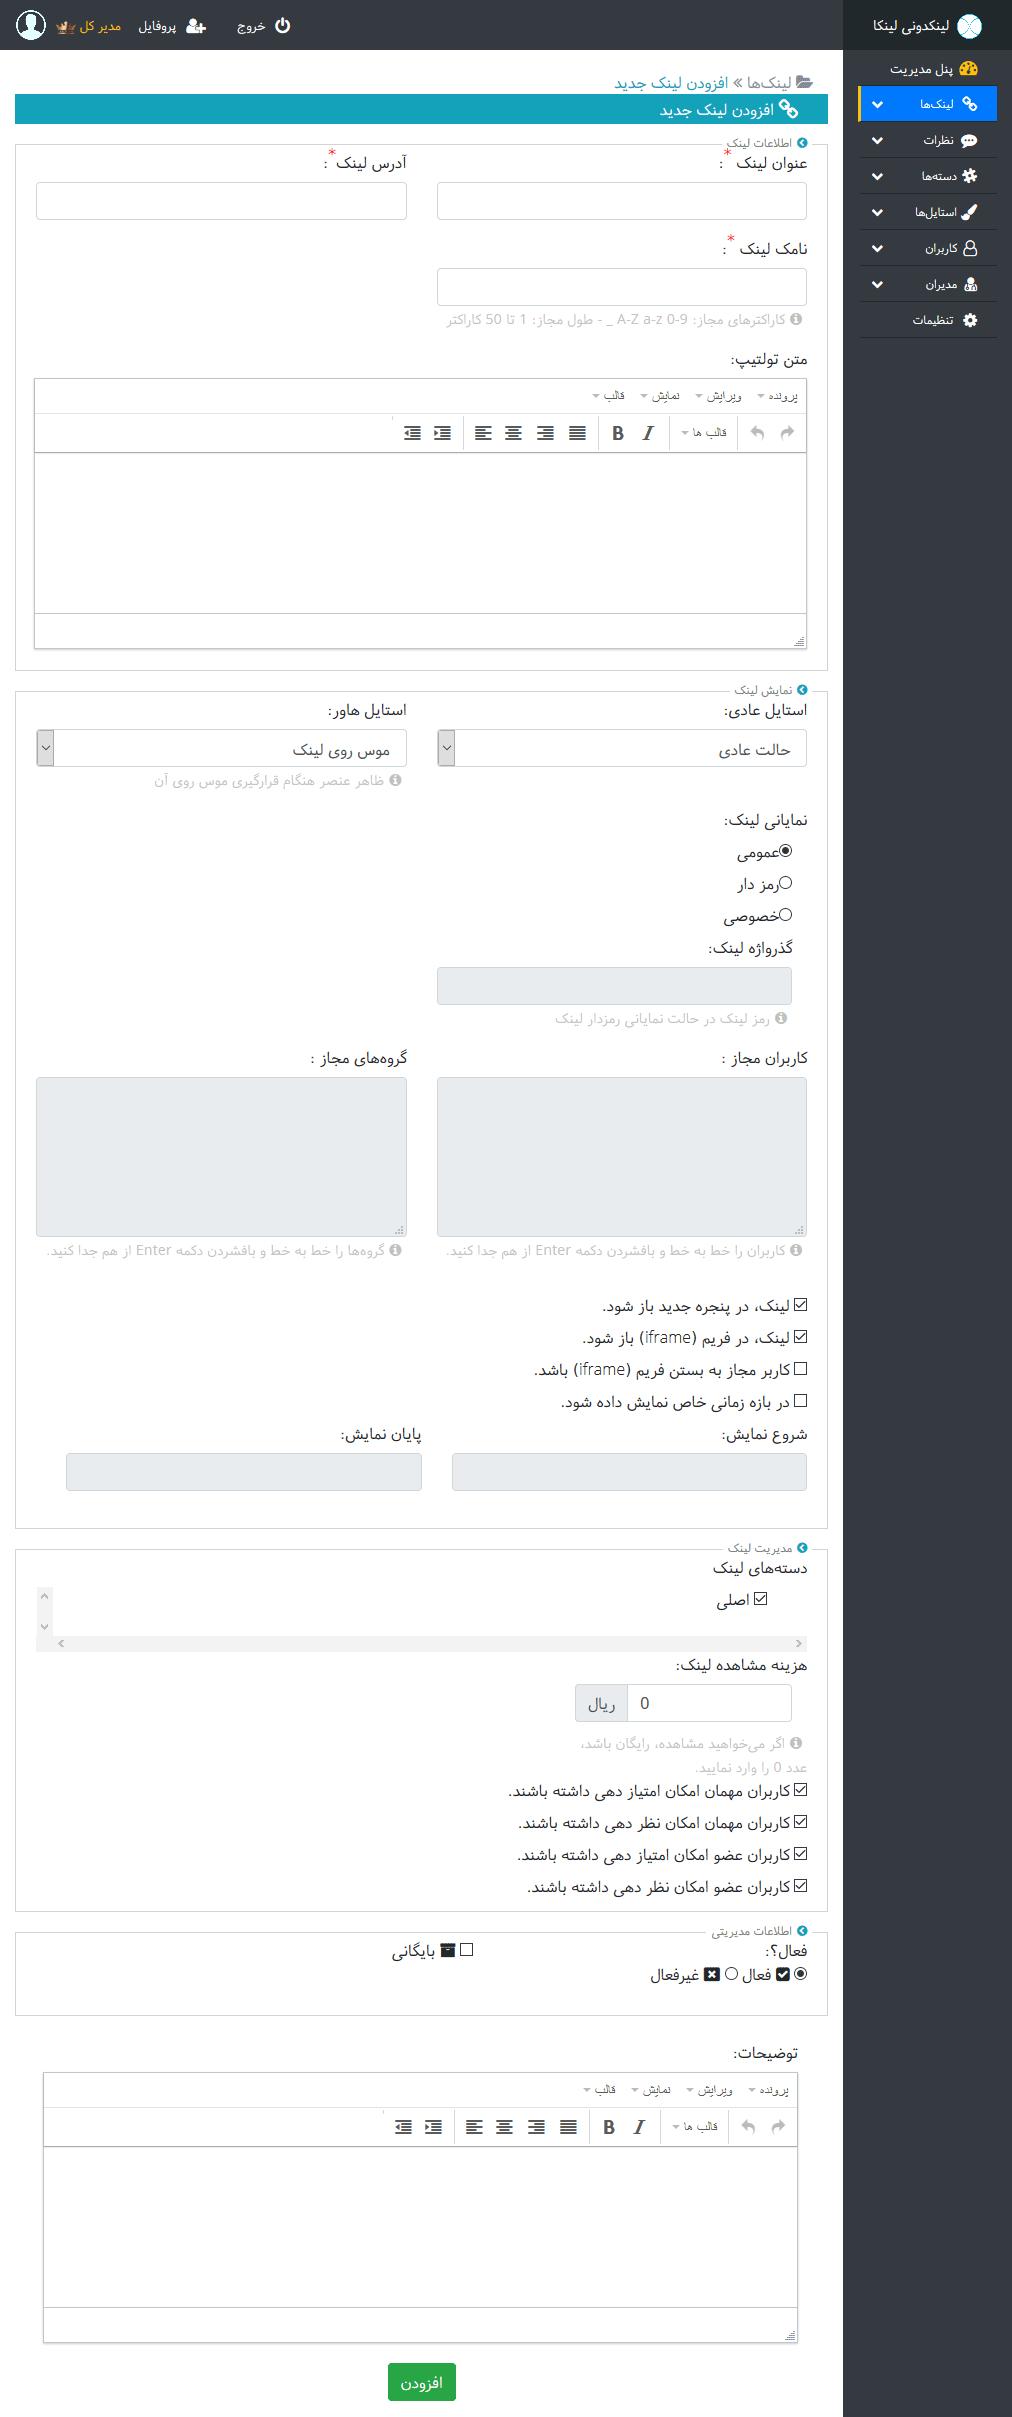 http://img.aftab.cc/products/linka/linka3_screenshot3.png